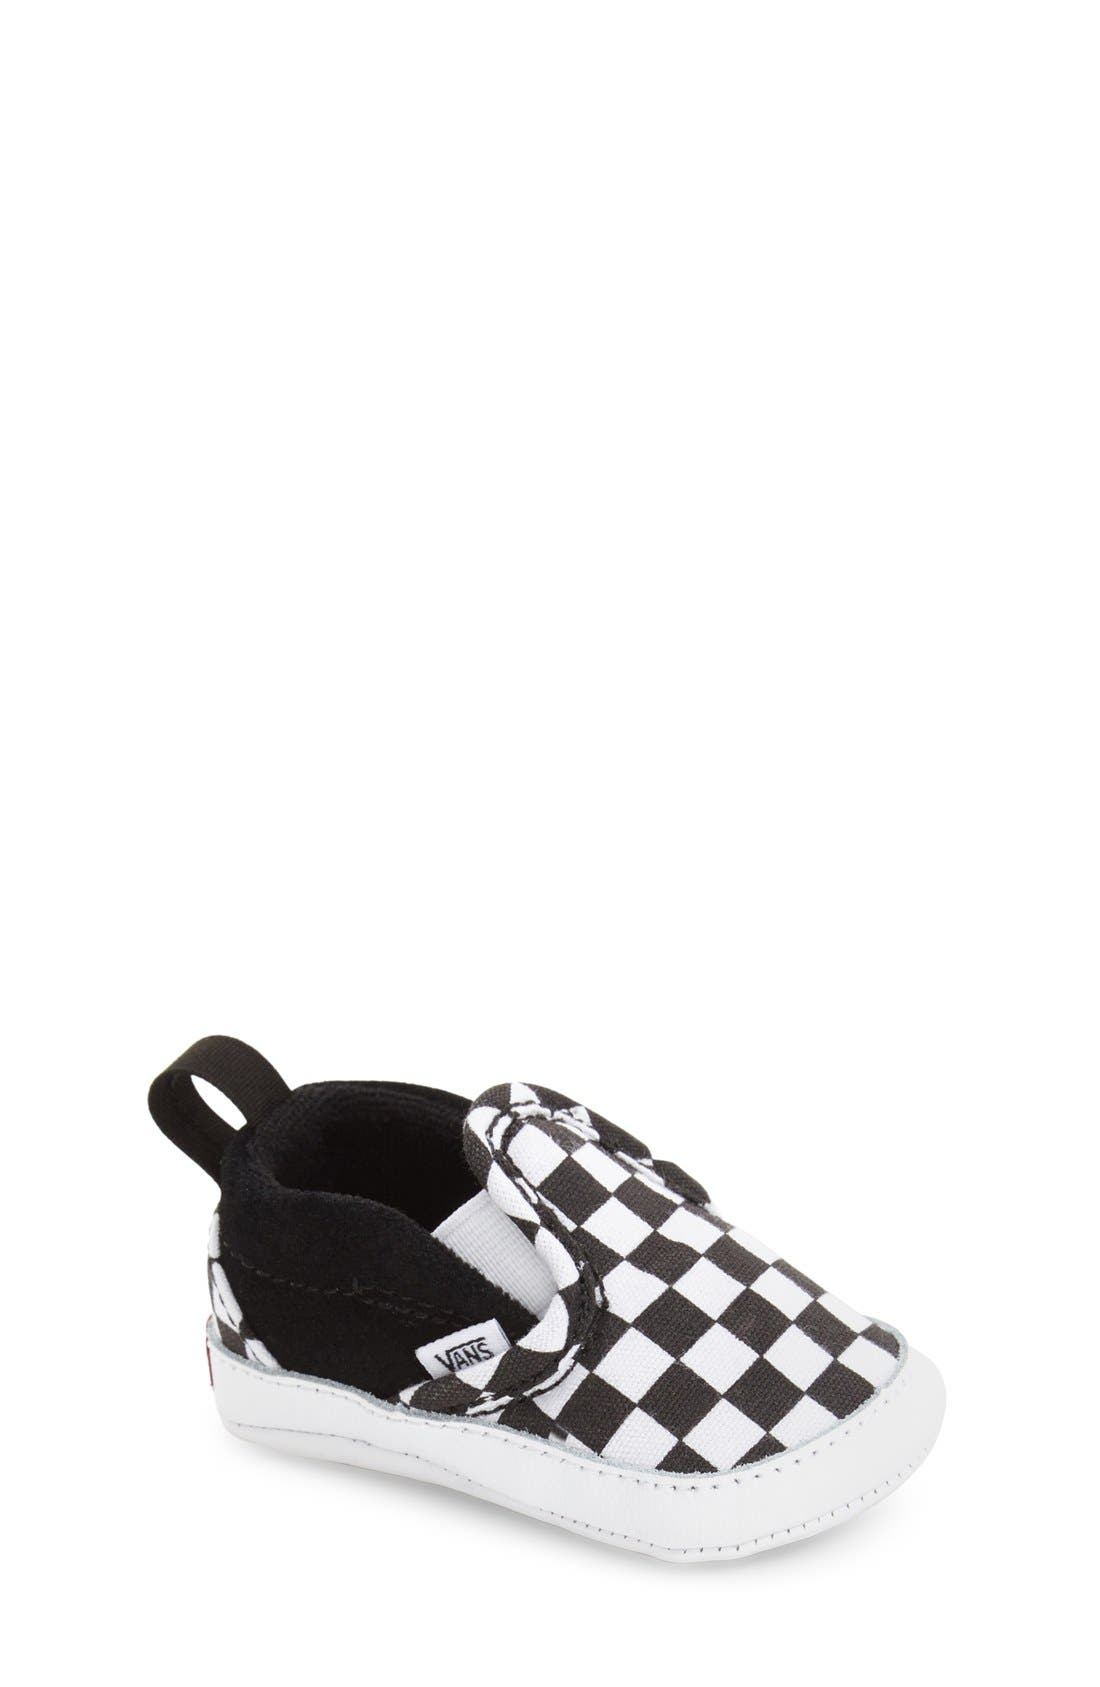 Vans Slip-On Crib Shoe (Baby)